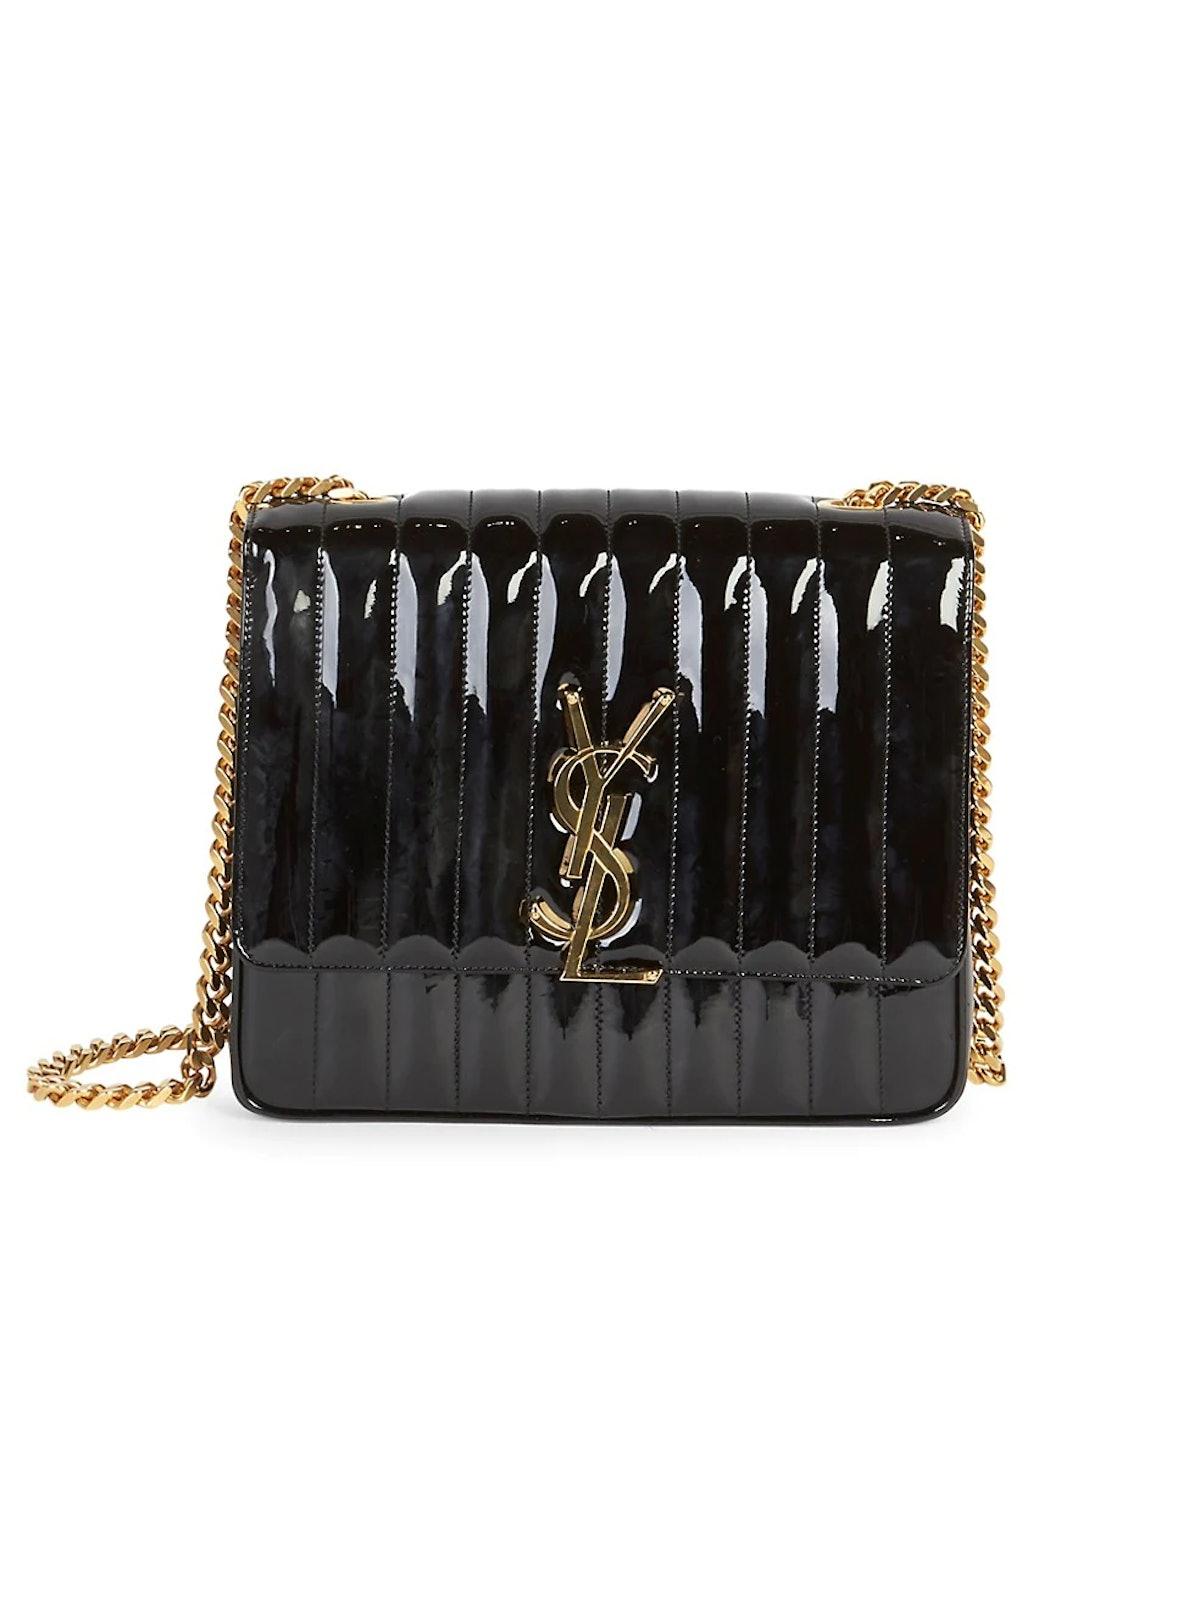 Large Vicky Matelassé Patent Leather Shoulder Bag